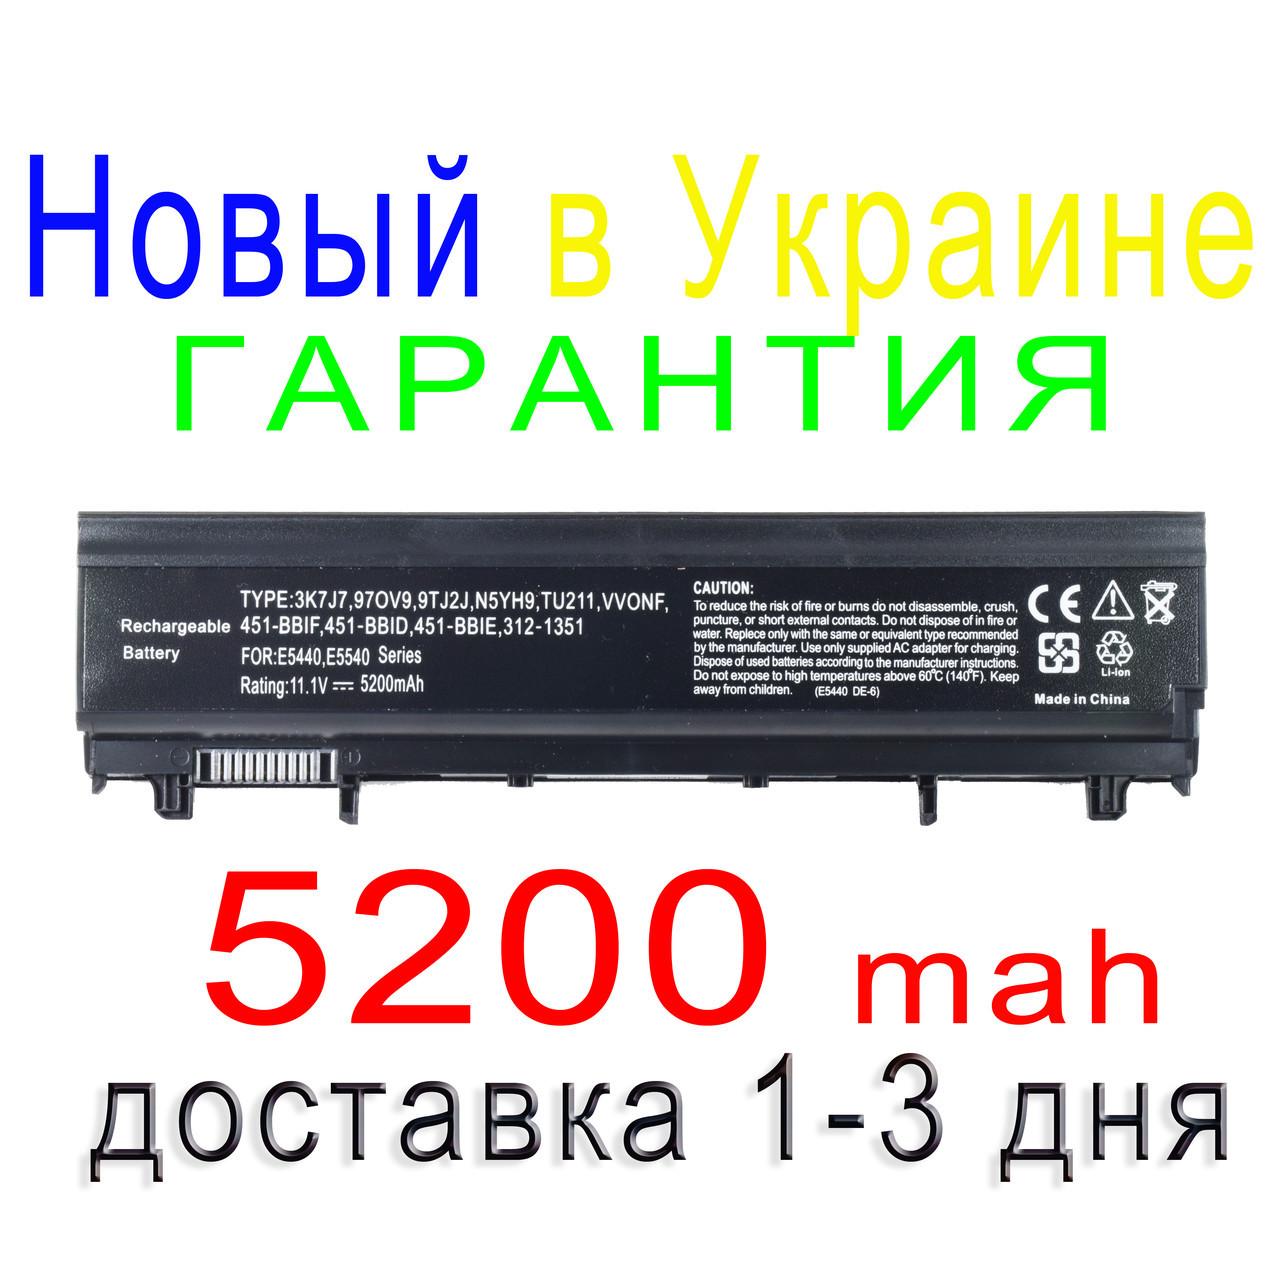 Аккумулятор батарея Dell 451-BBIF 312-1351 0M7T5F 0WGCW6 0Y6KM7 1N9C0 3K7J7 45HHN